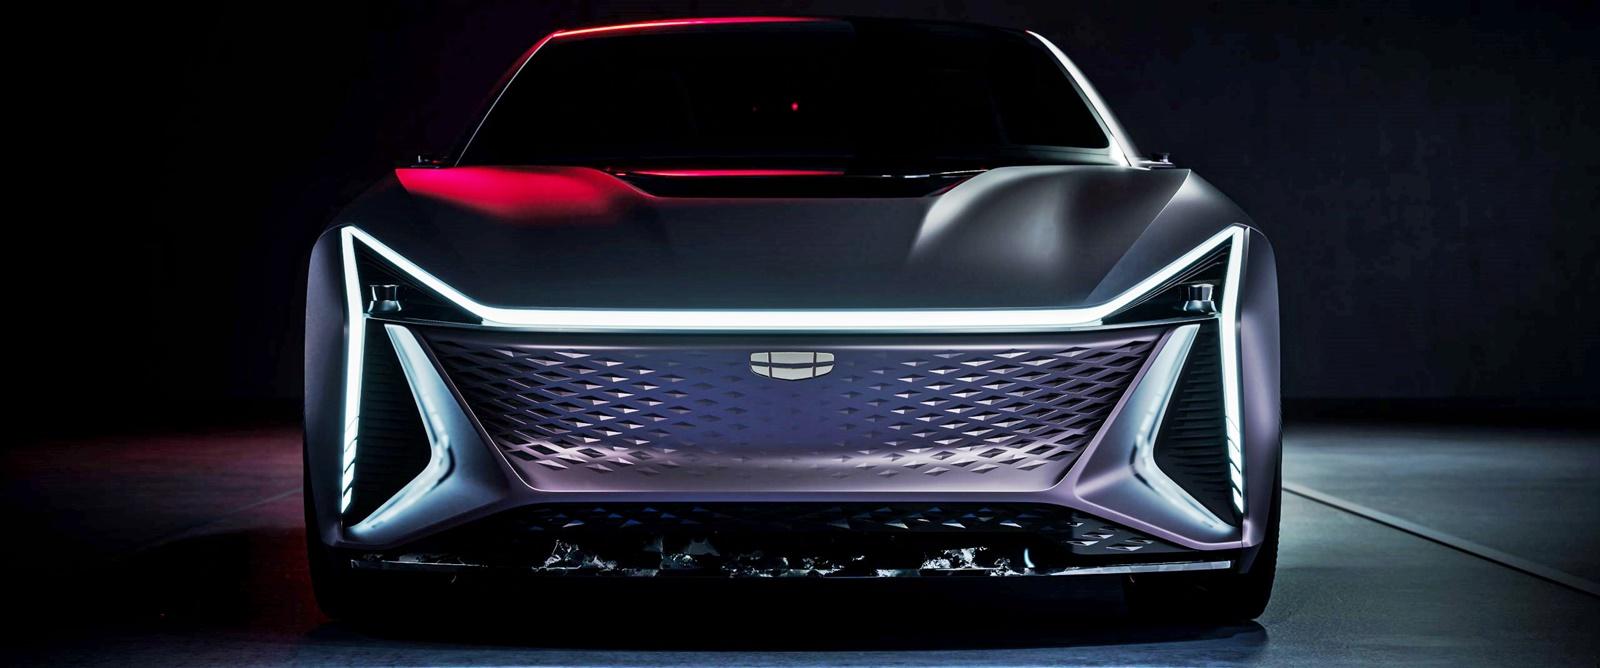 2021 Geely Vision Starburst concept